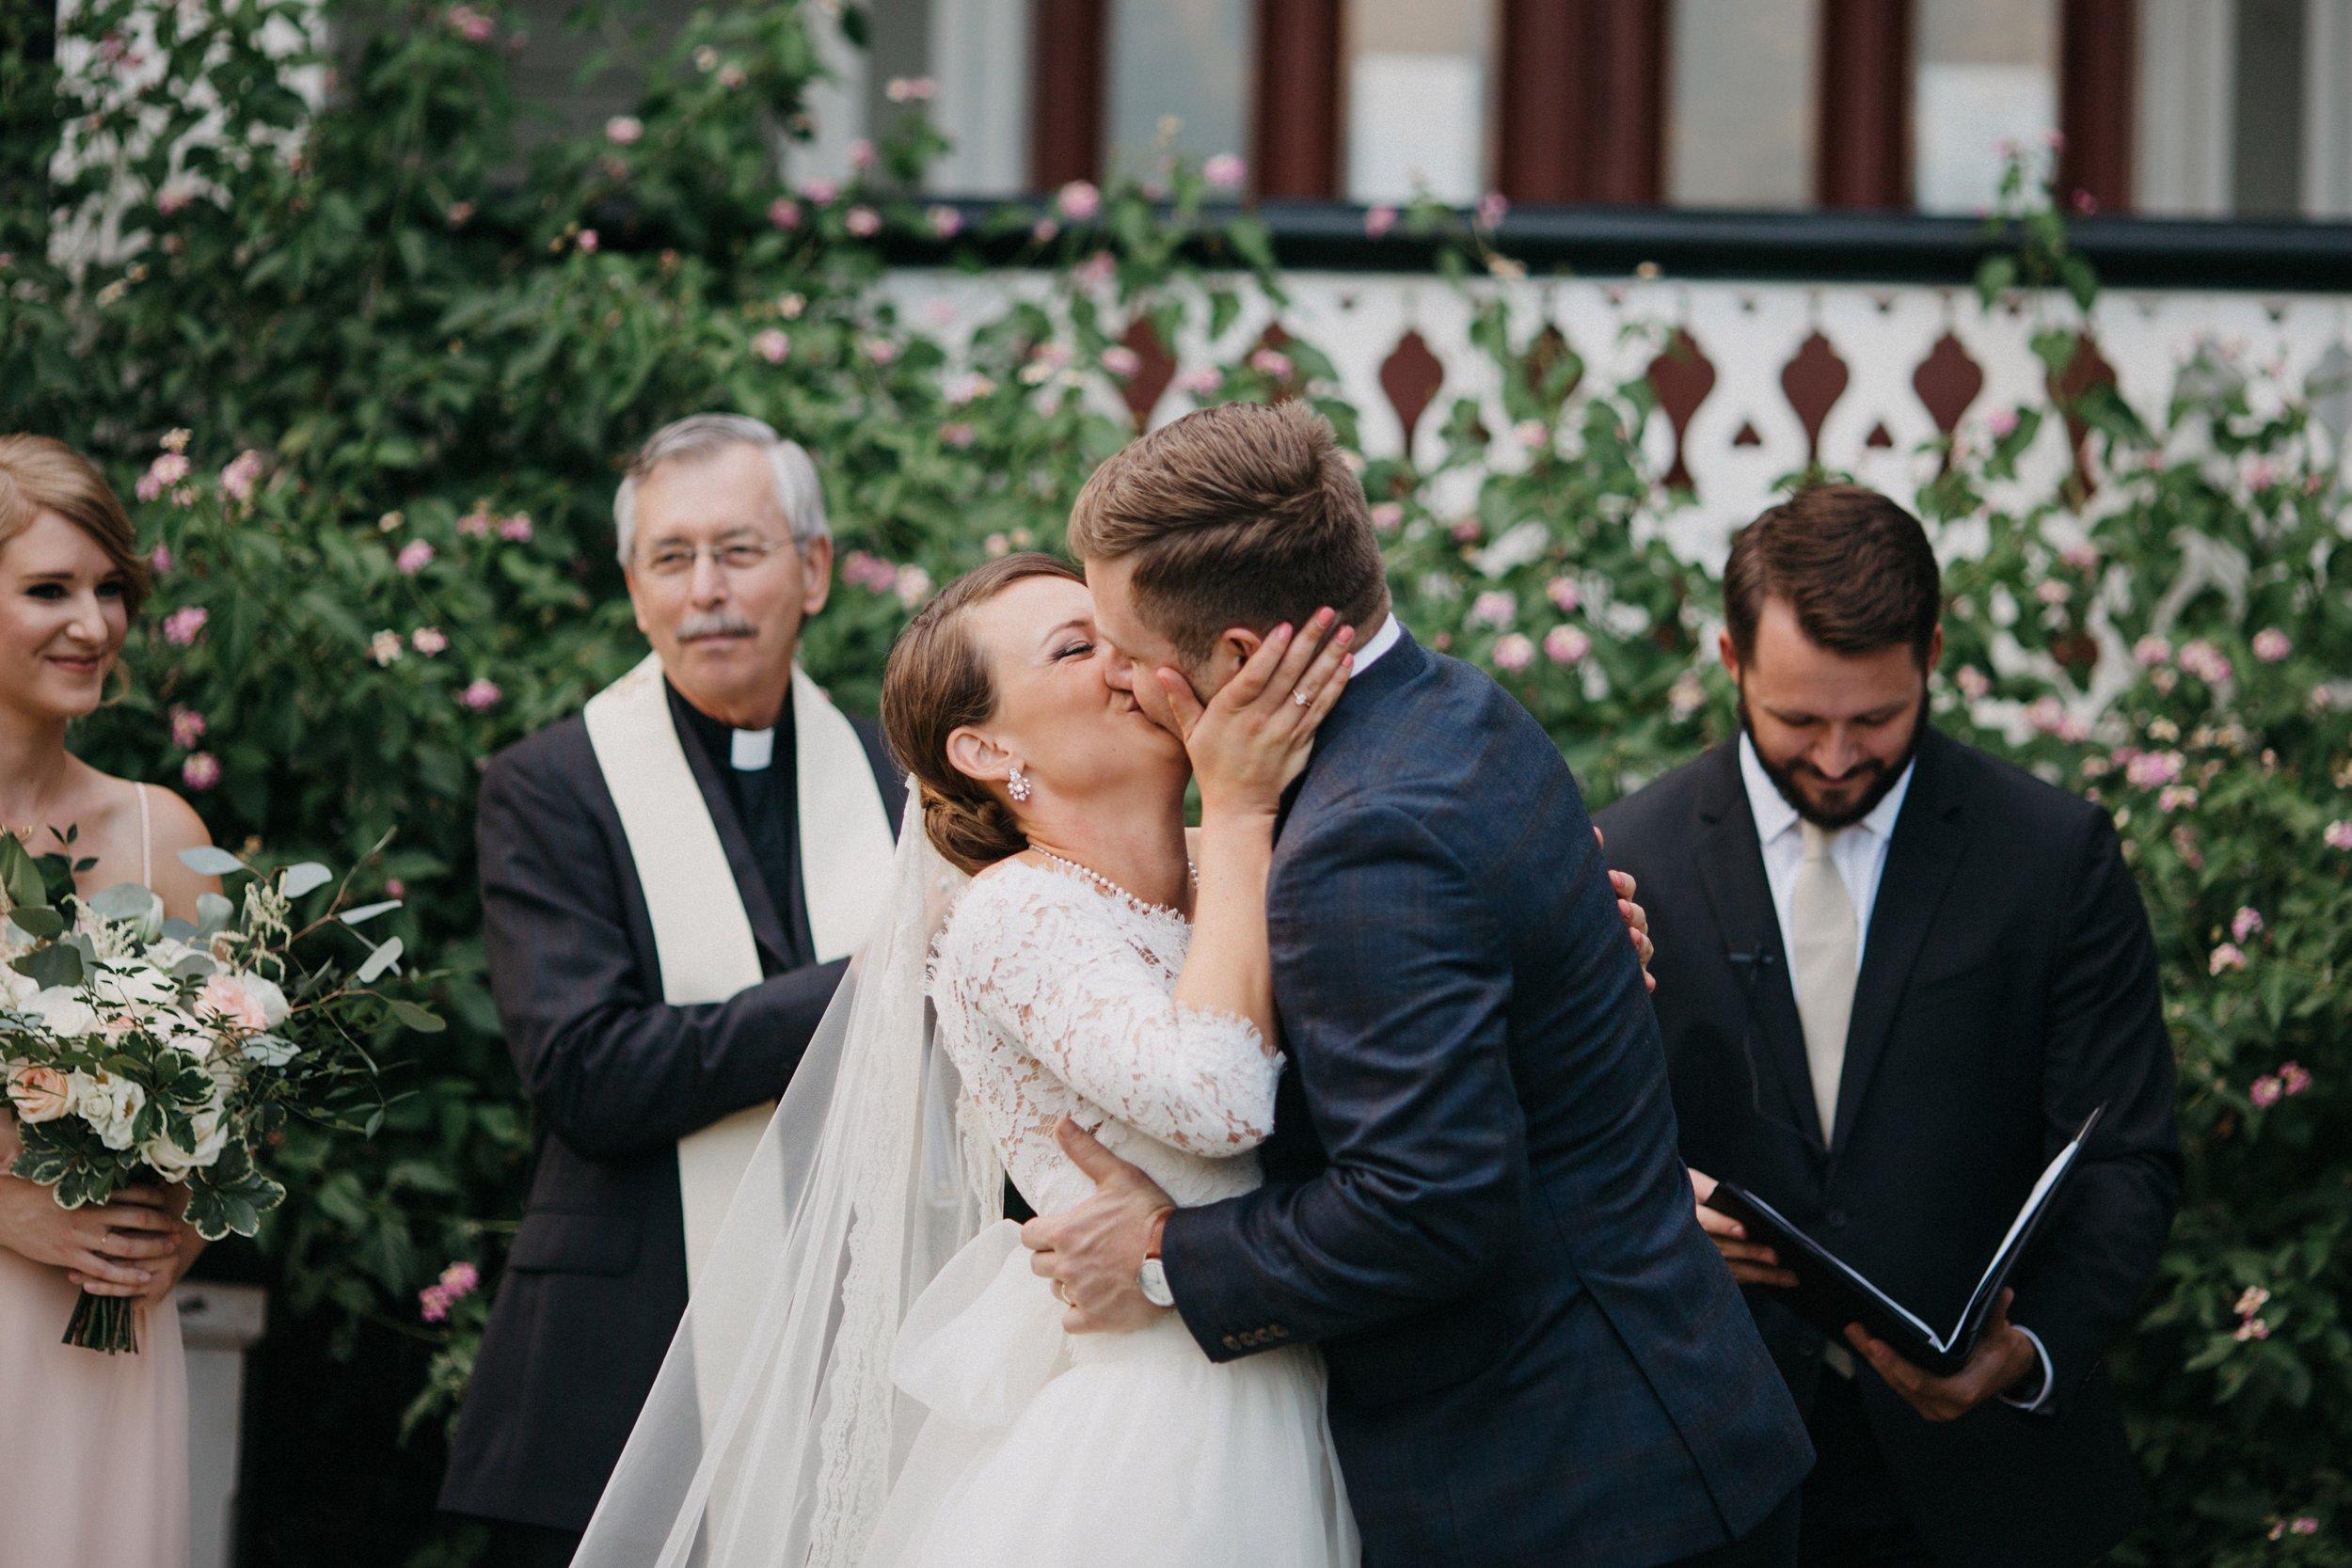 weddingday-425.jpg